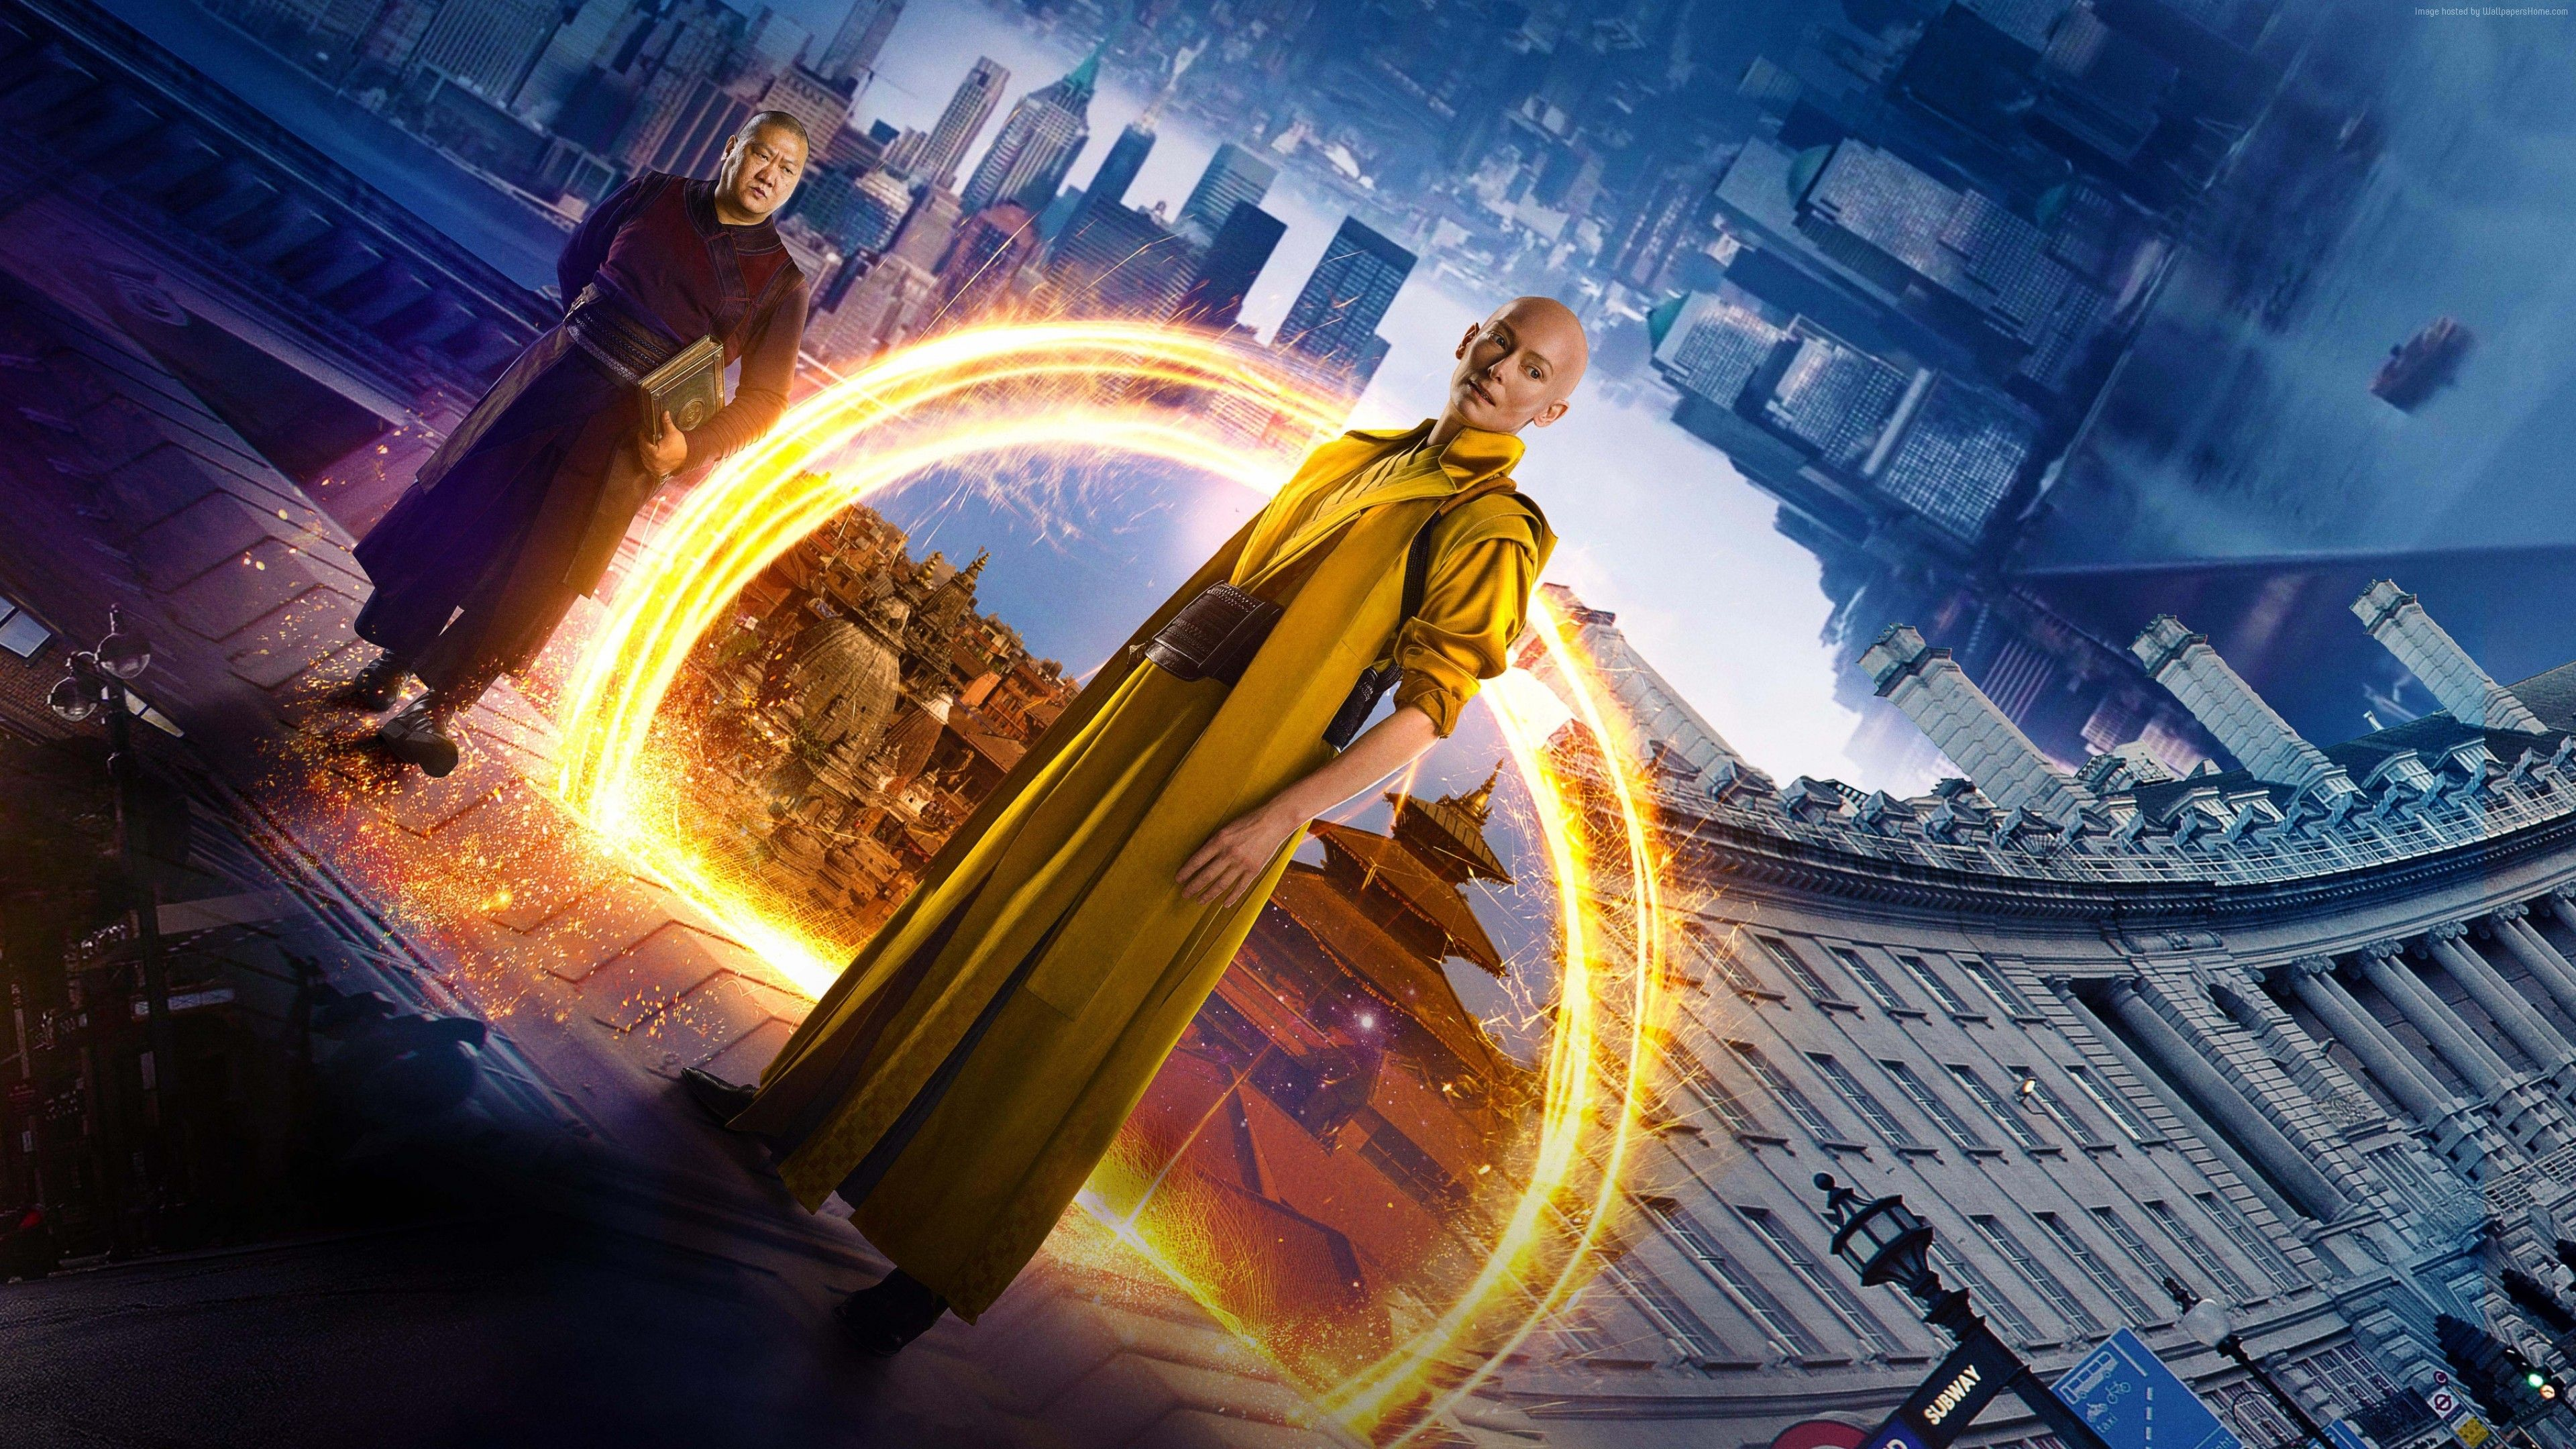 Doctor Strange Marvel Movie Wallpapers Widescreen Cinema: Tilda Swinton The Ancient One Doctor Strange HD Wallpaper